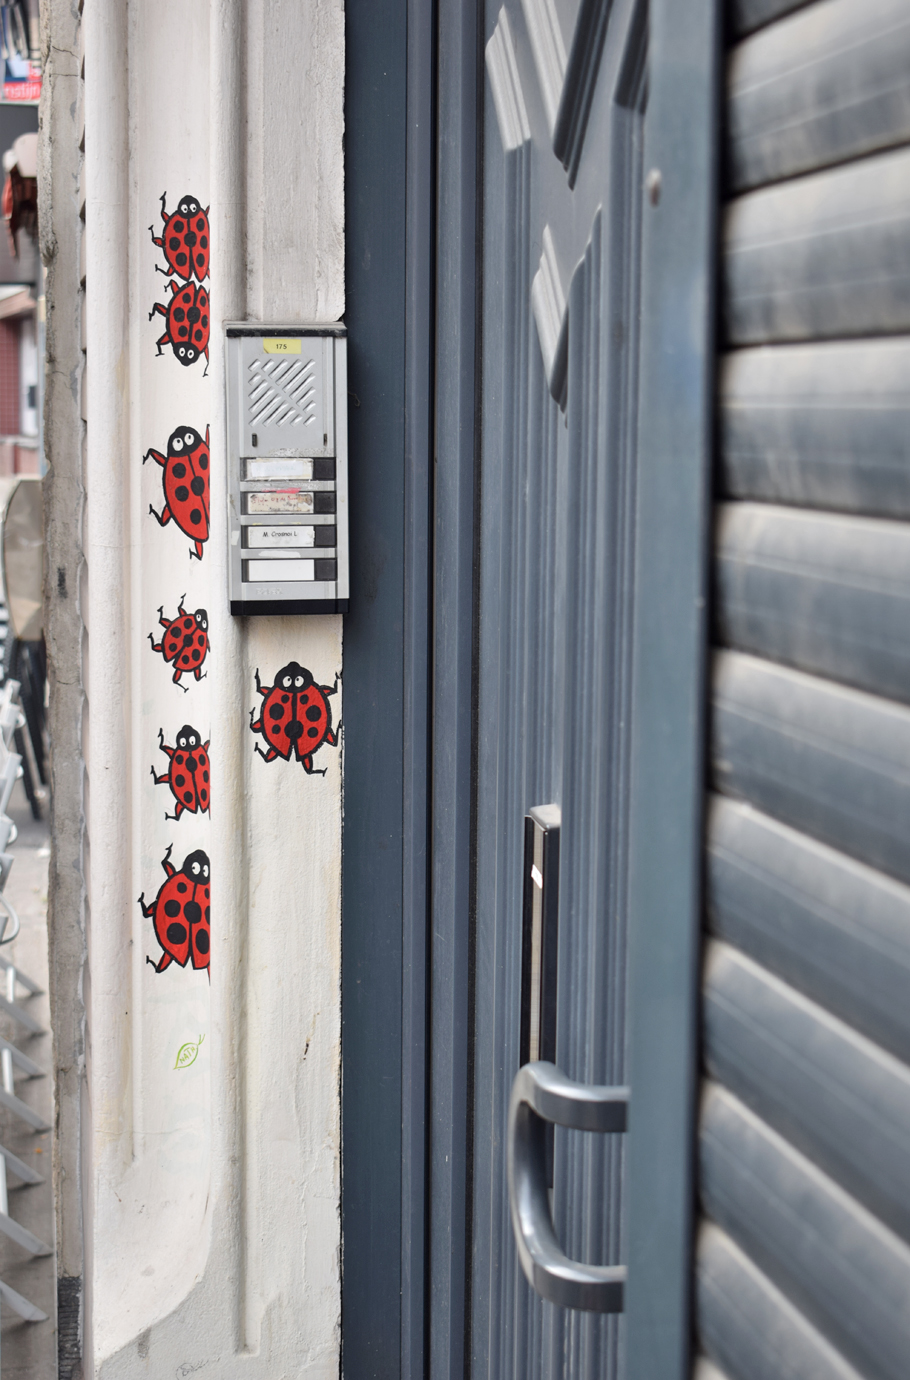 Brussels street art doorway